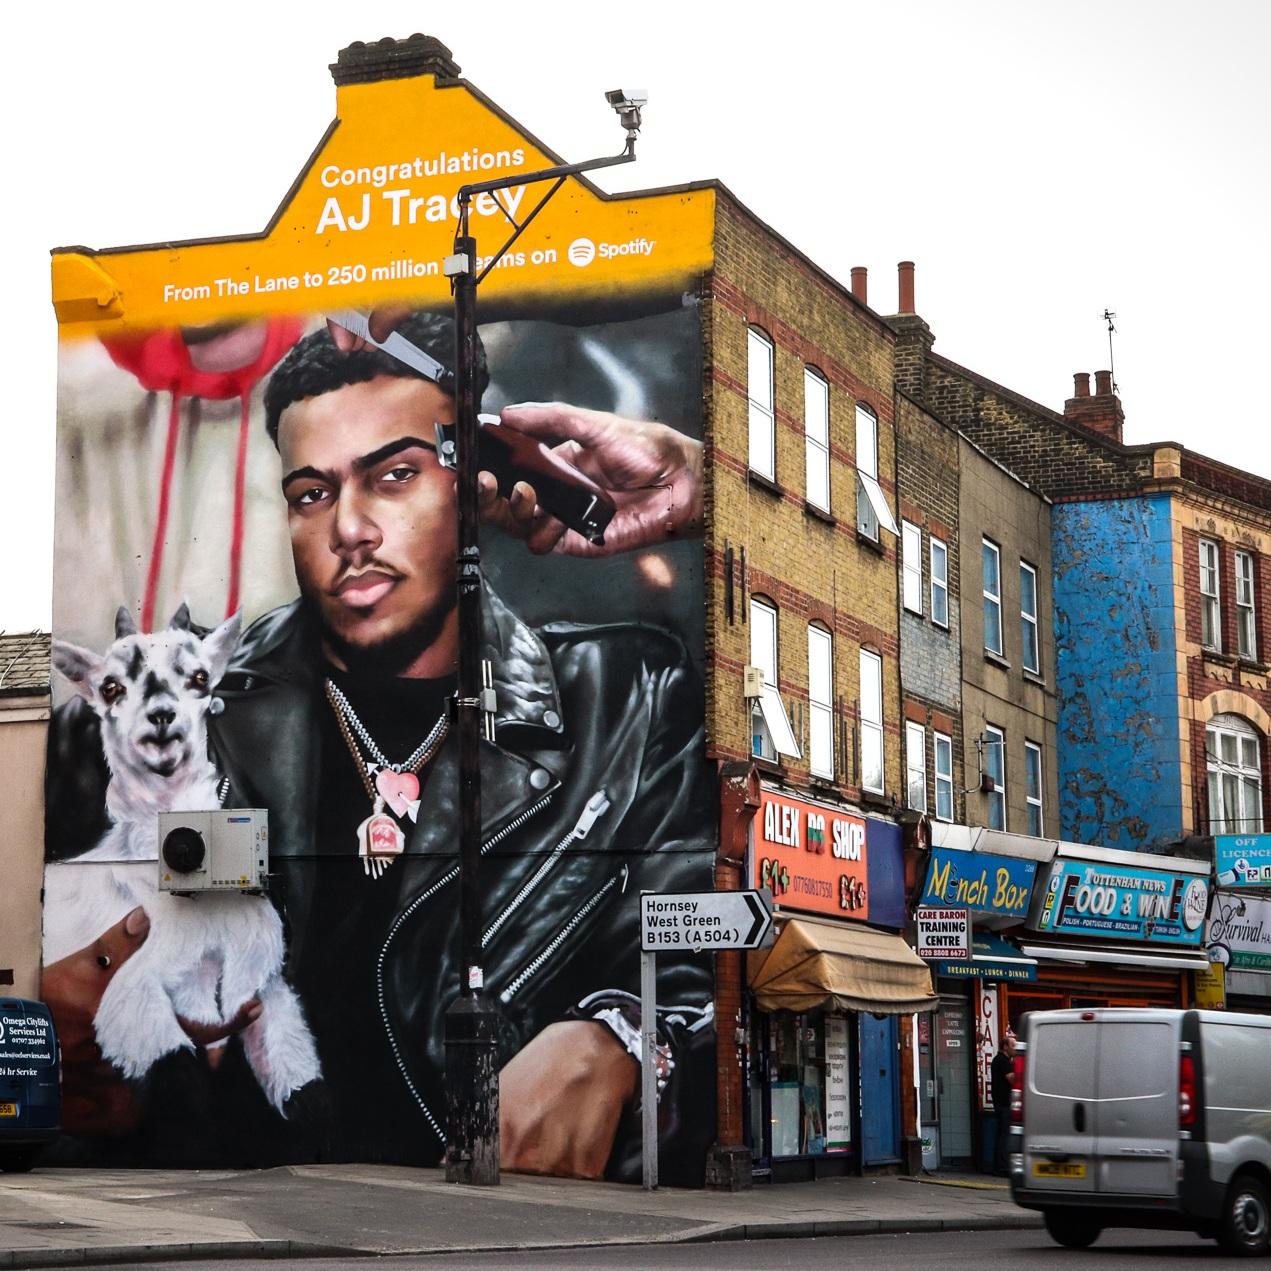 Spotify+-+AJ+Tracey+-+Tottenham+4.jpg